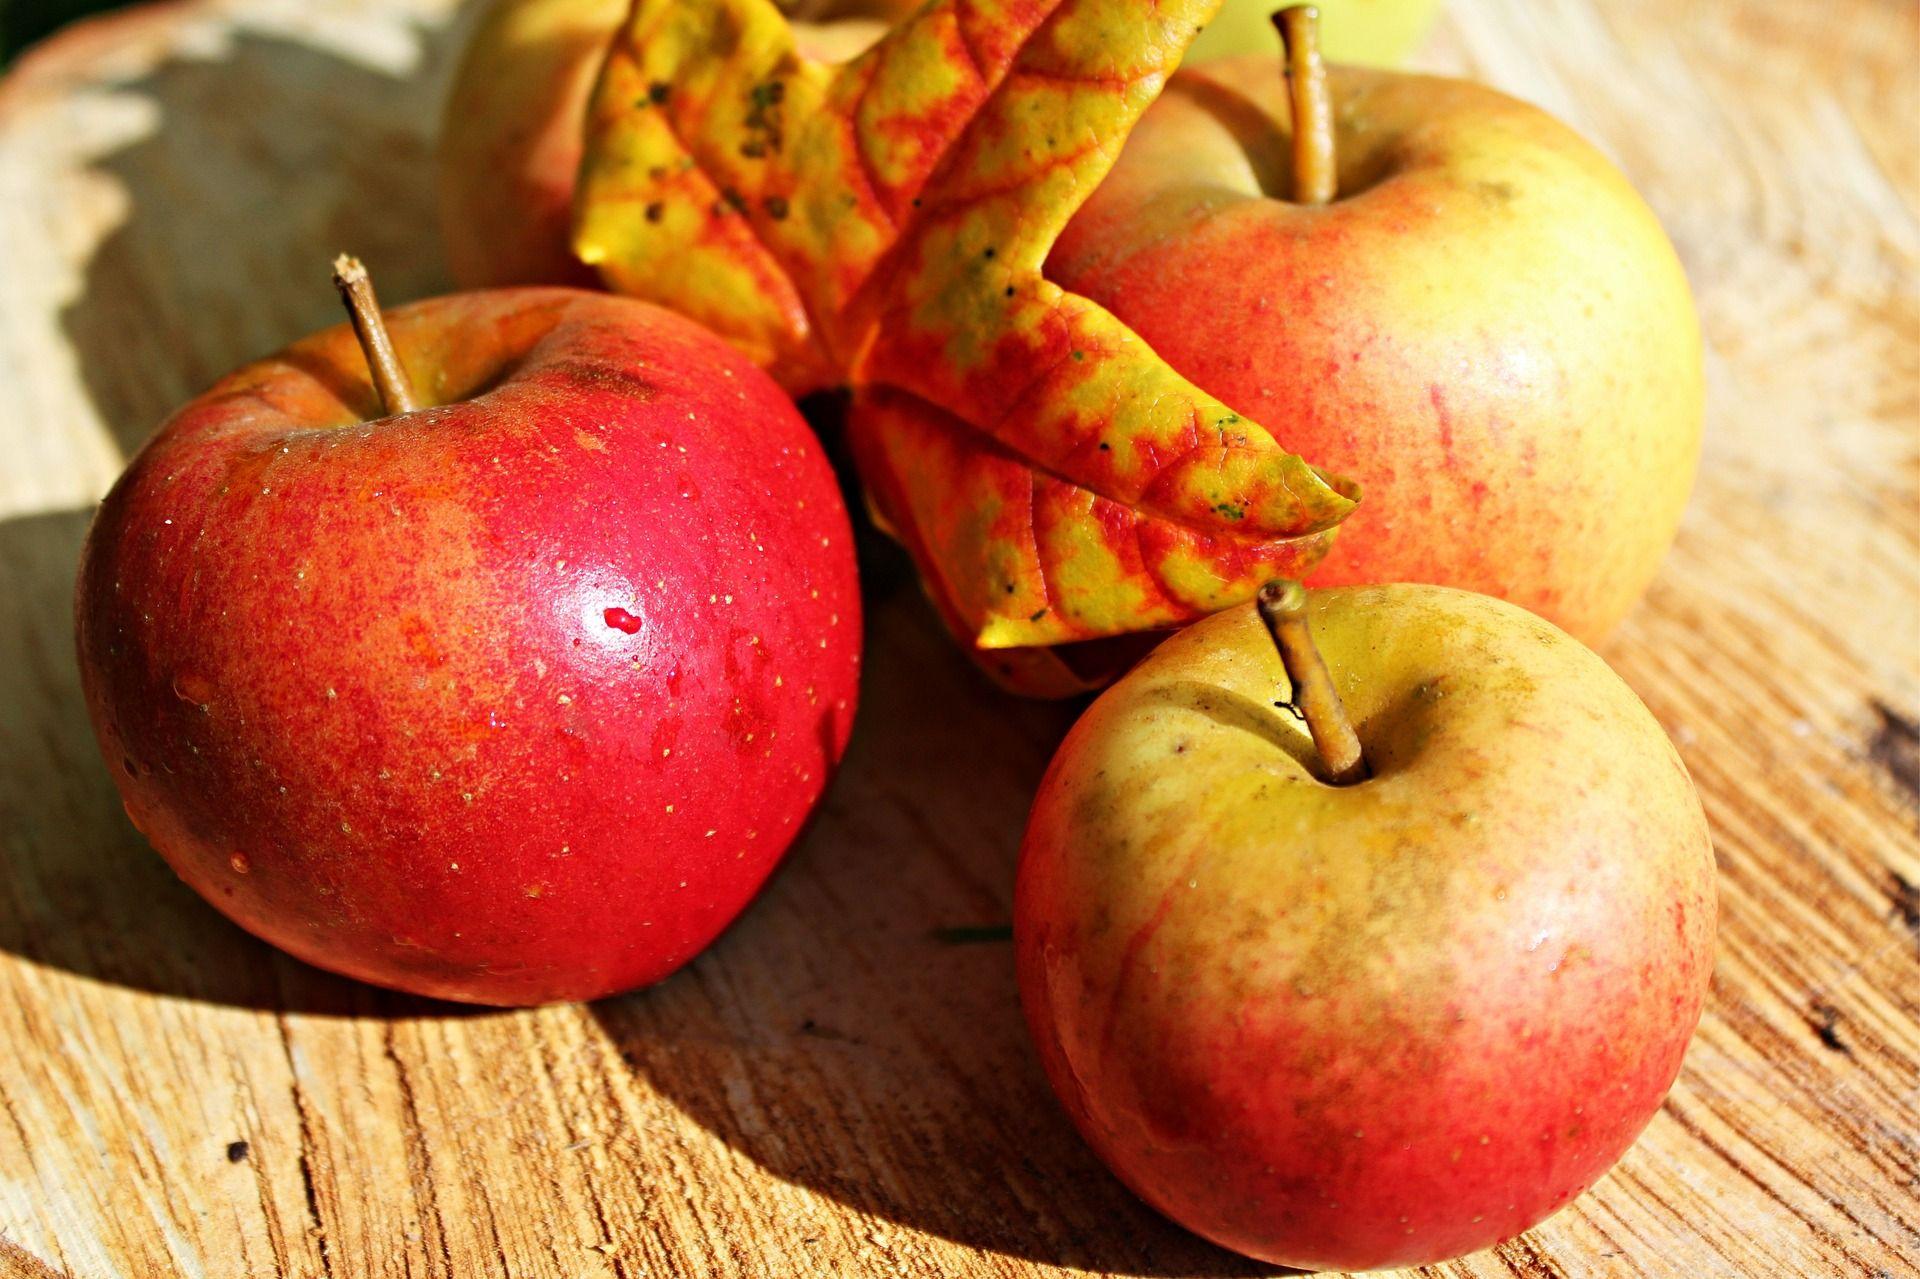 apple quinoa bake  apple fruit apple health benefits